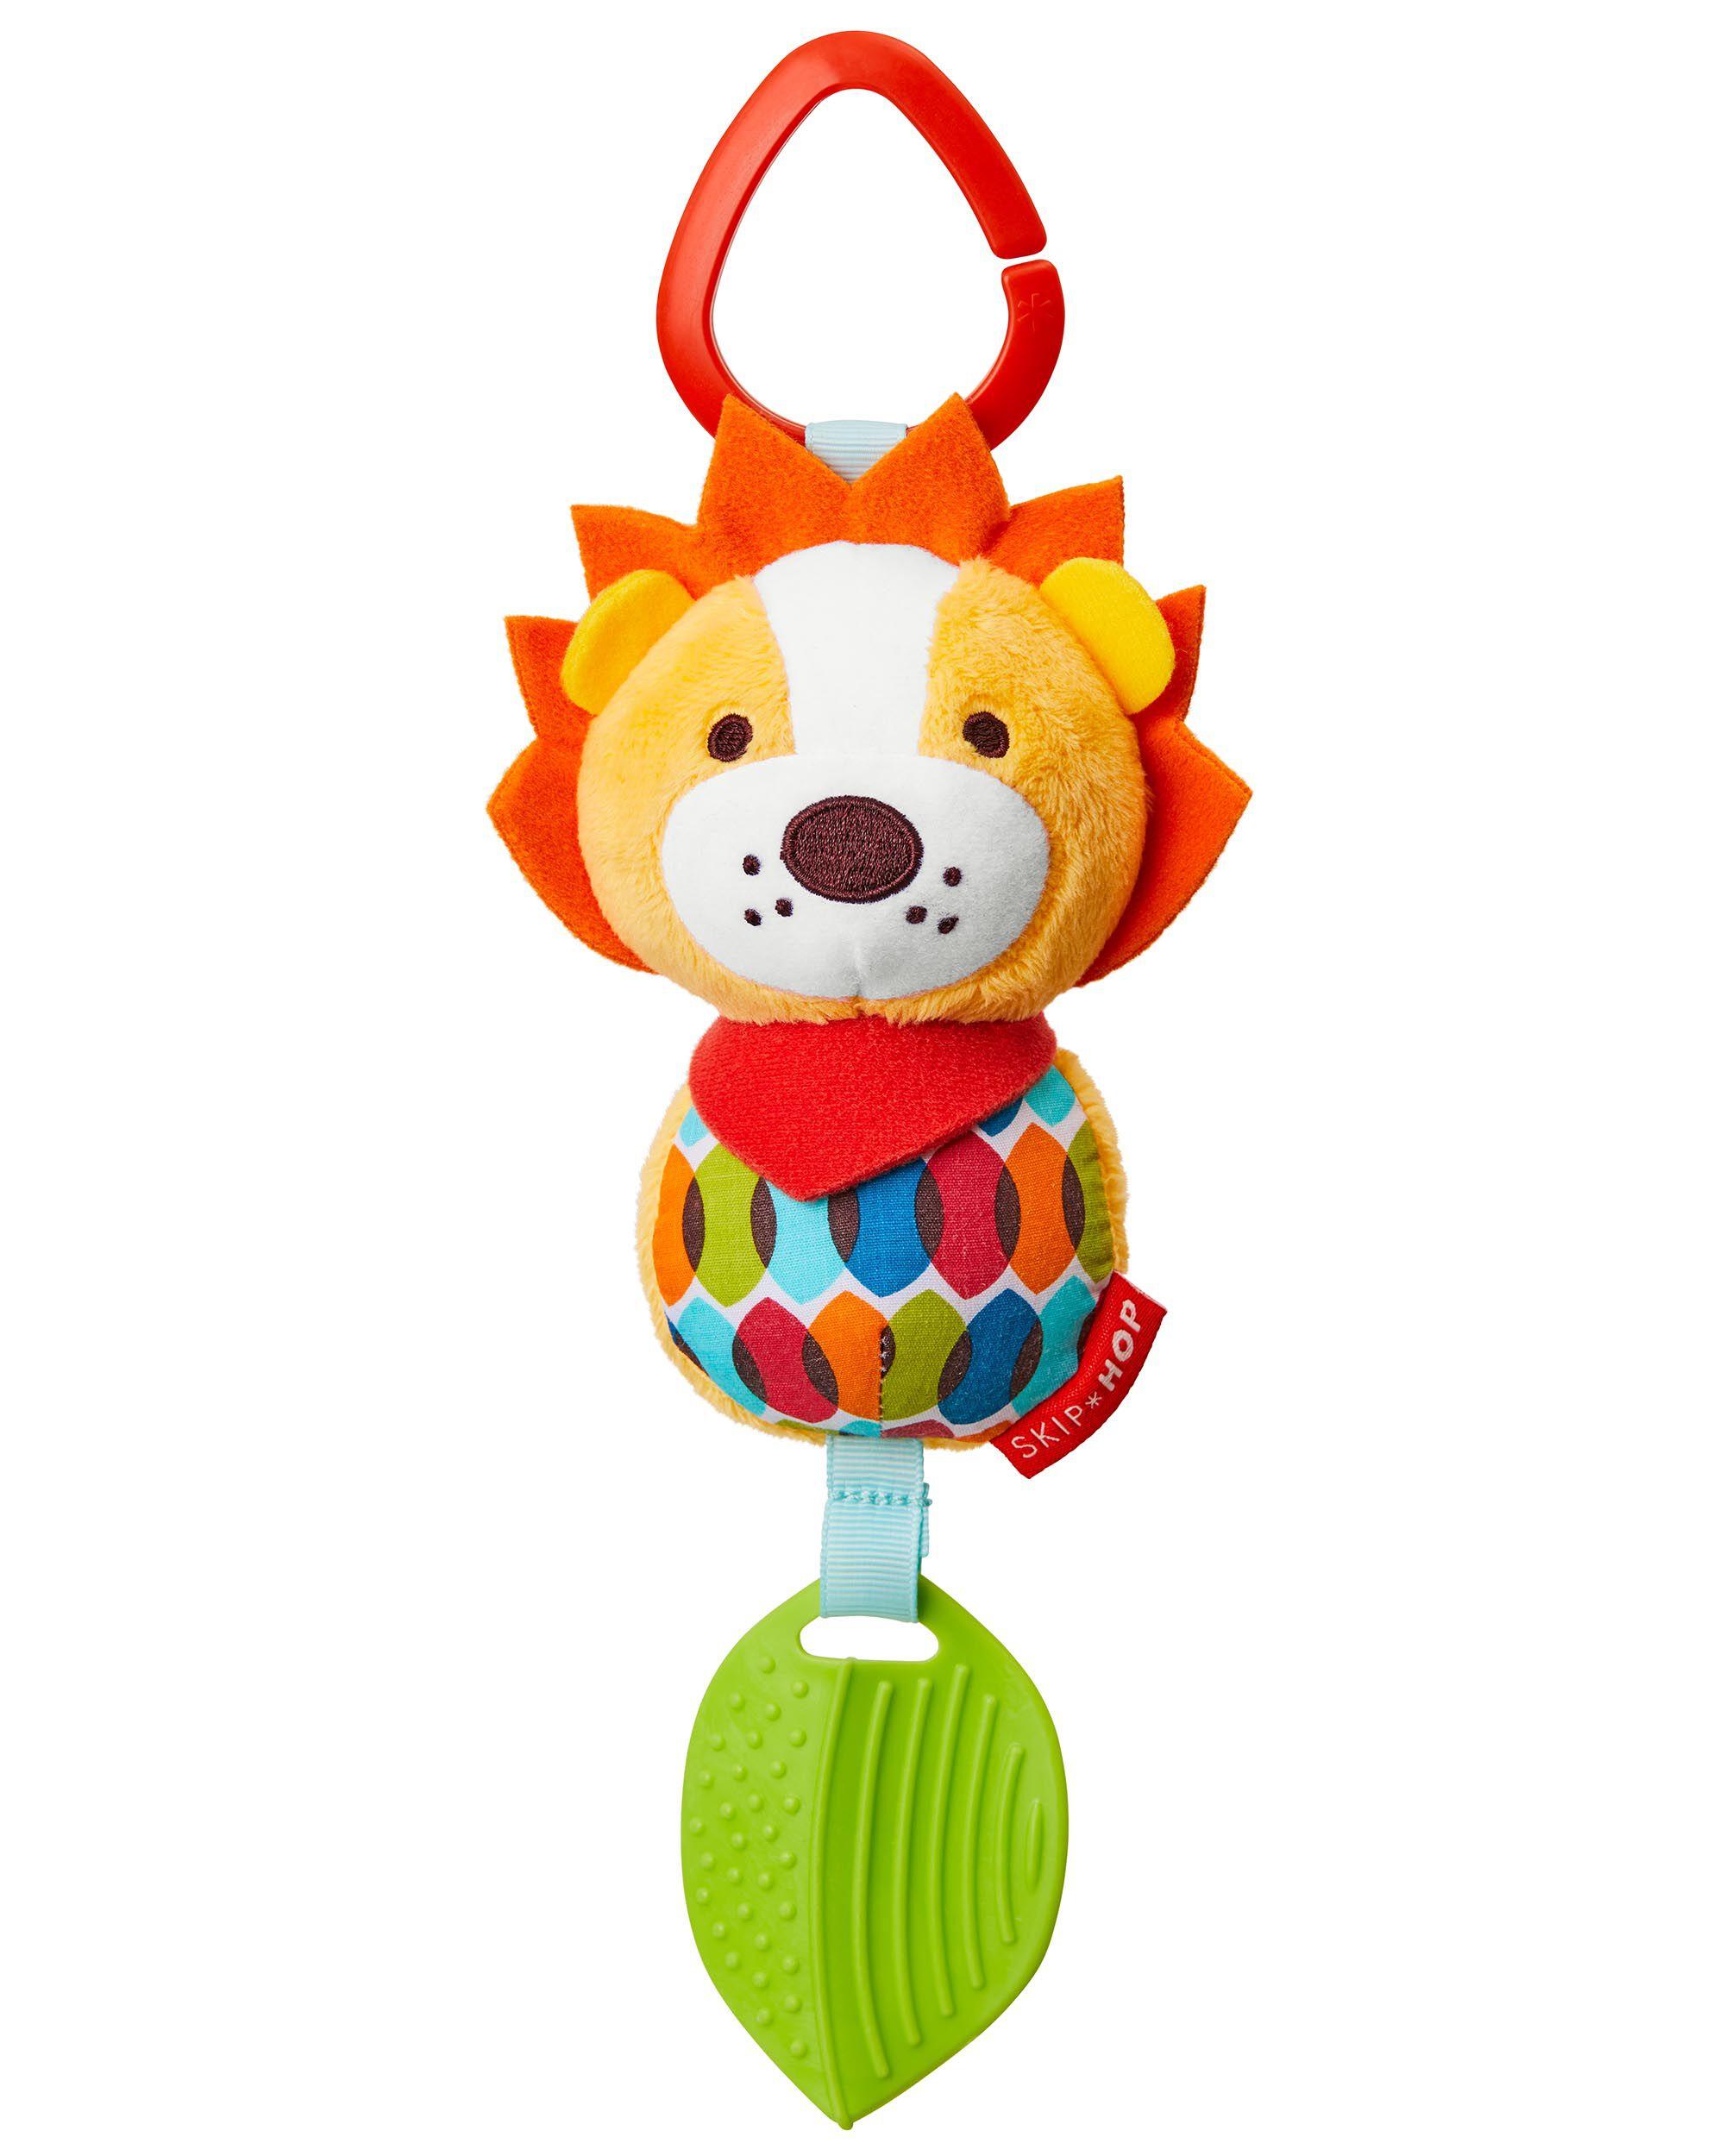 Carters Bandana Buddies Chime & Teethe Toy